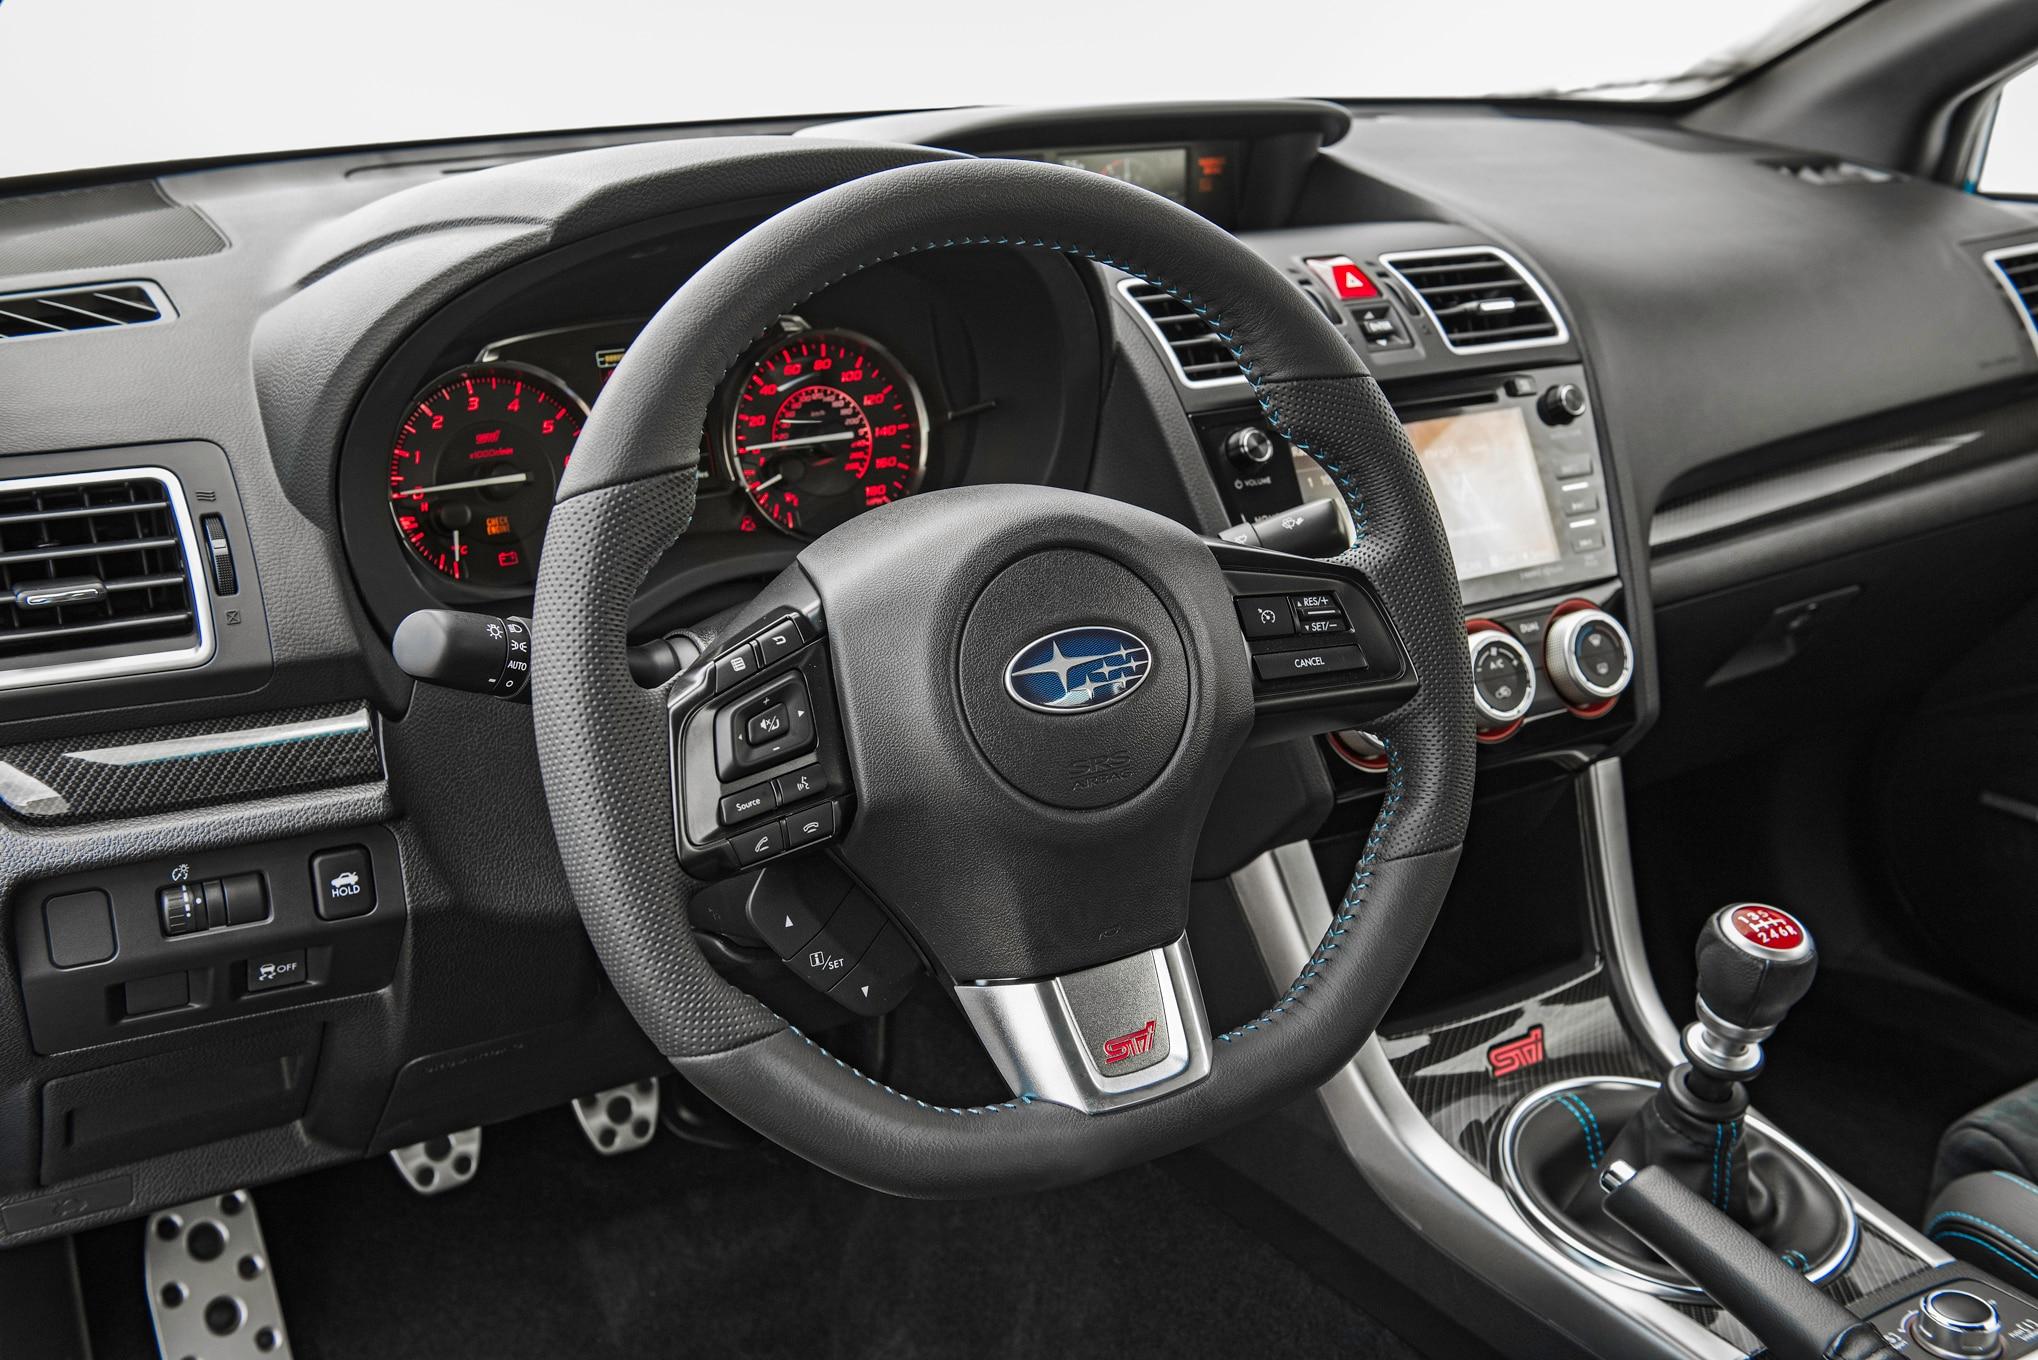 2016 Subaru WRX STI Series HyperBlue steering wheel. 3|17